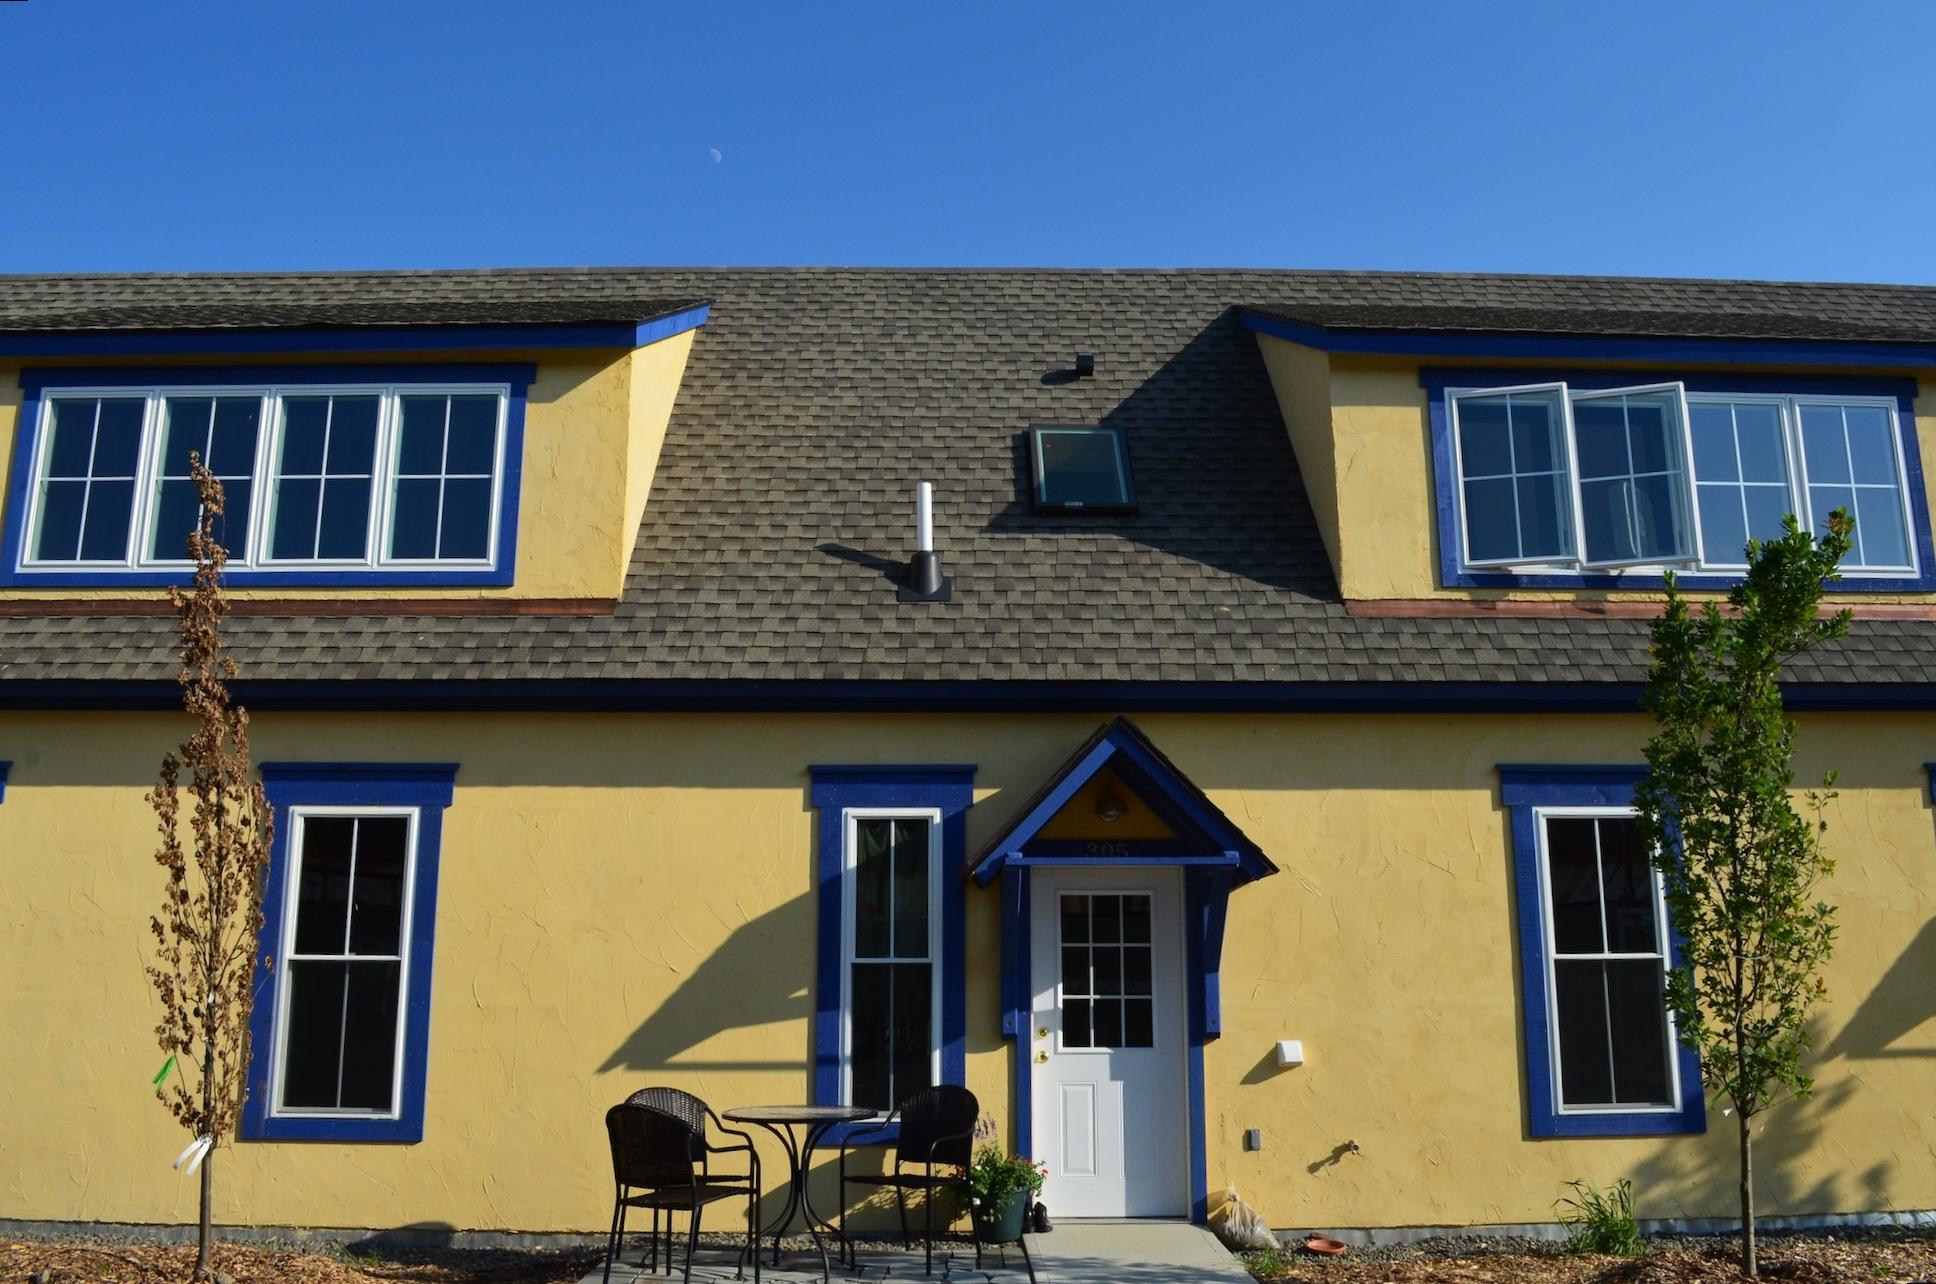 boiceville-cottages-yellow-gatehouse.jpg